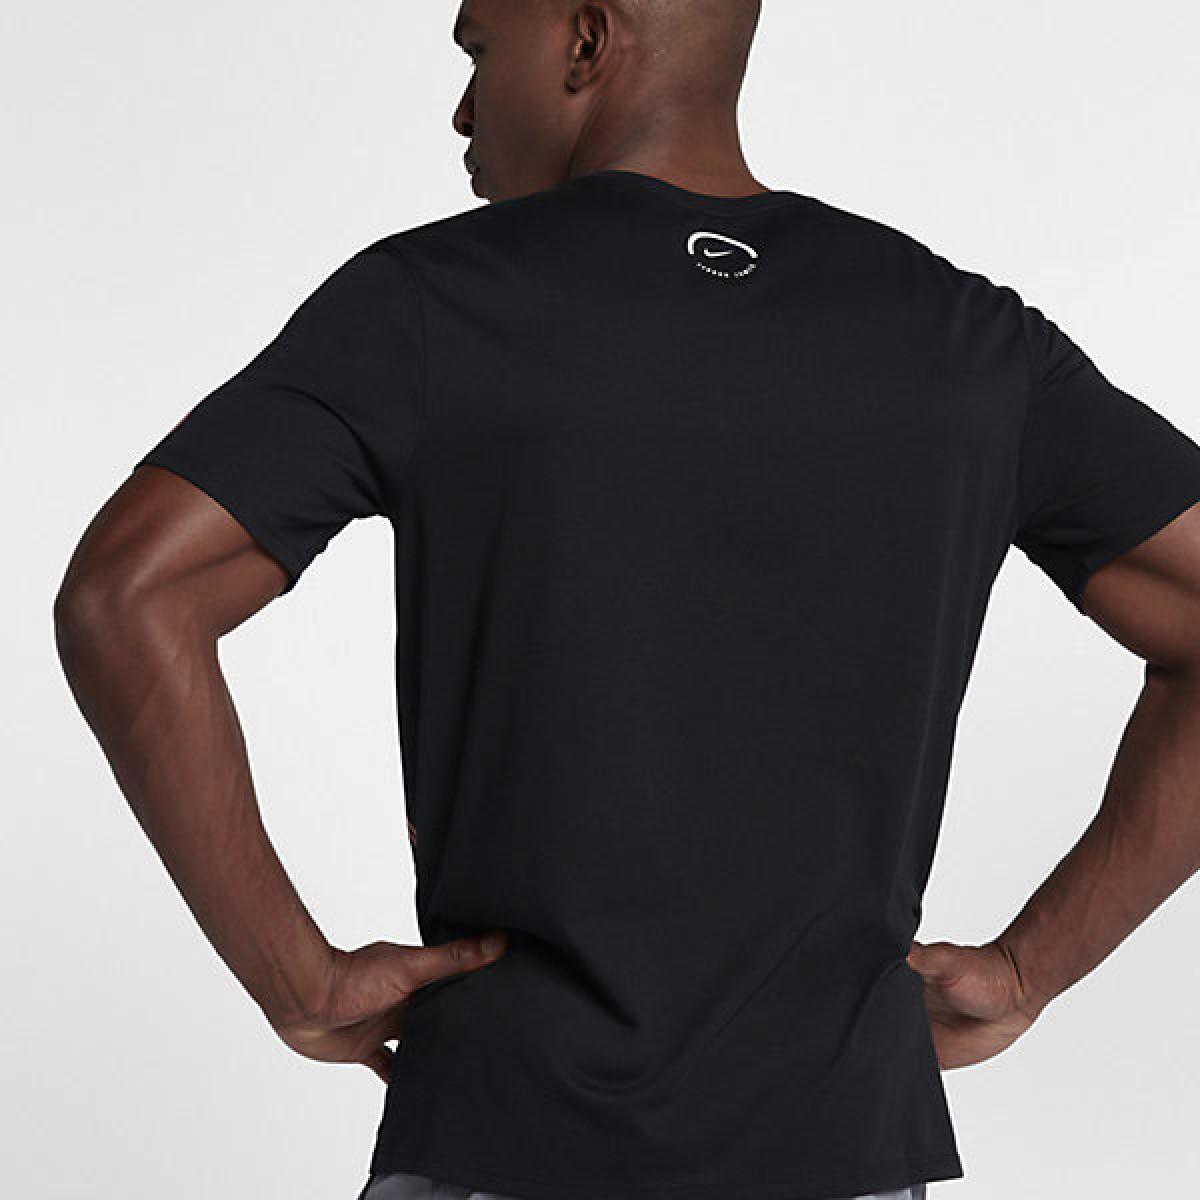 Nike LBJ dry tee famous 'Black' 882186-010